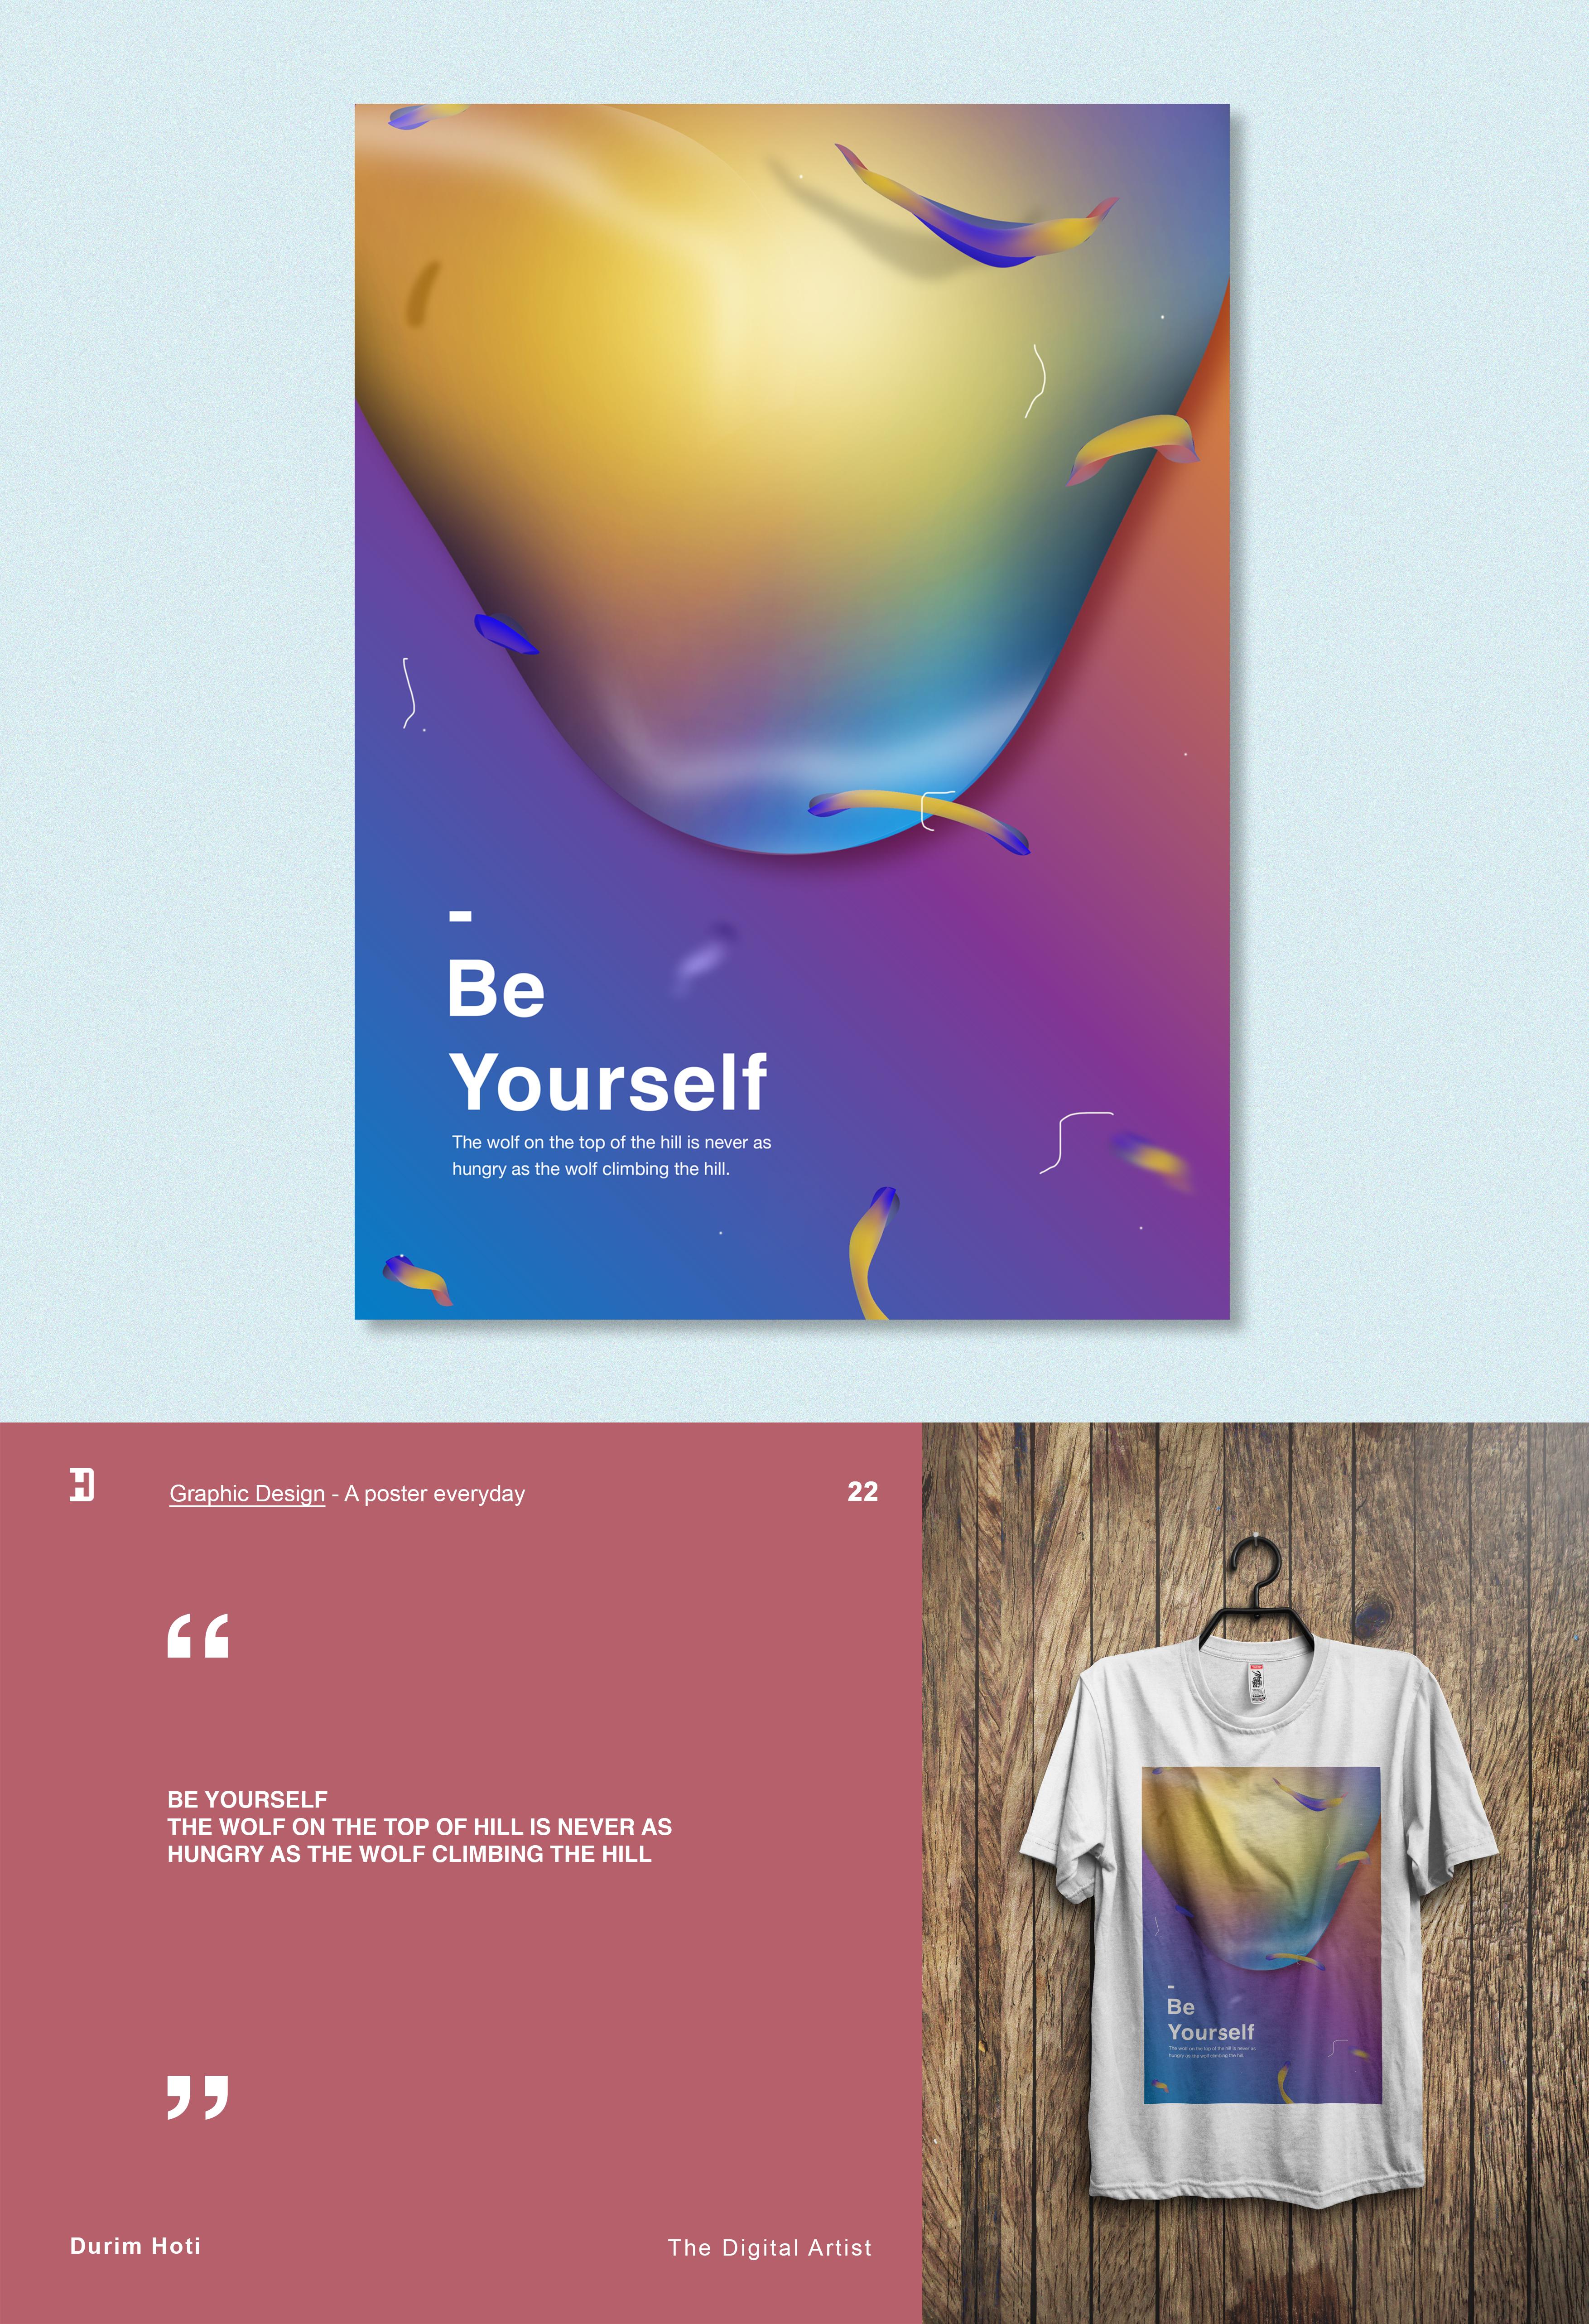 Design poster yourself - Design Poster Yourself 53